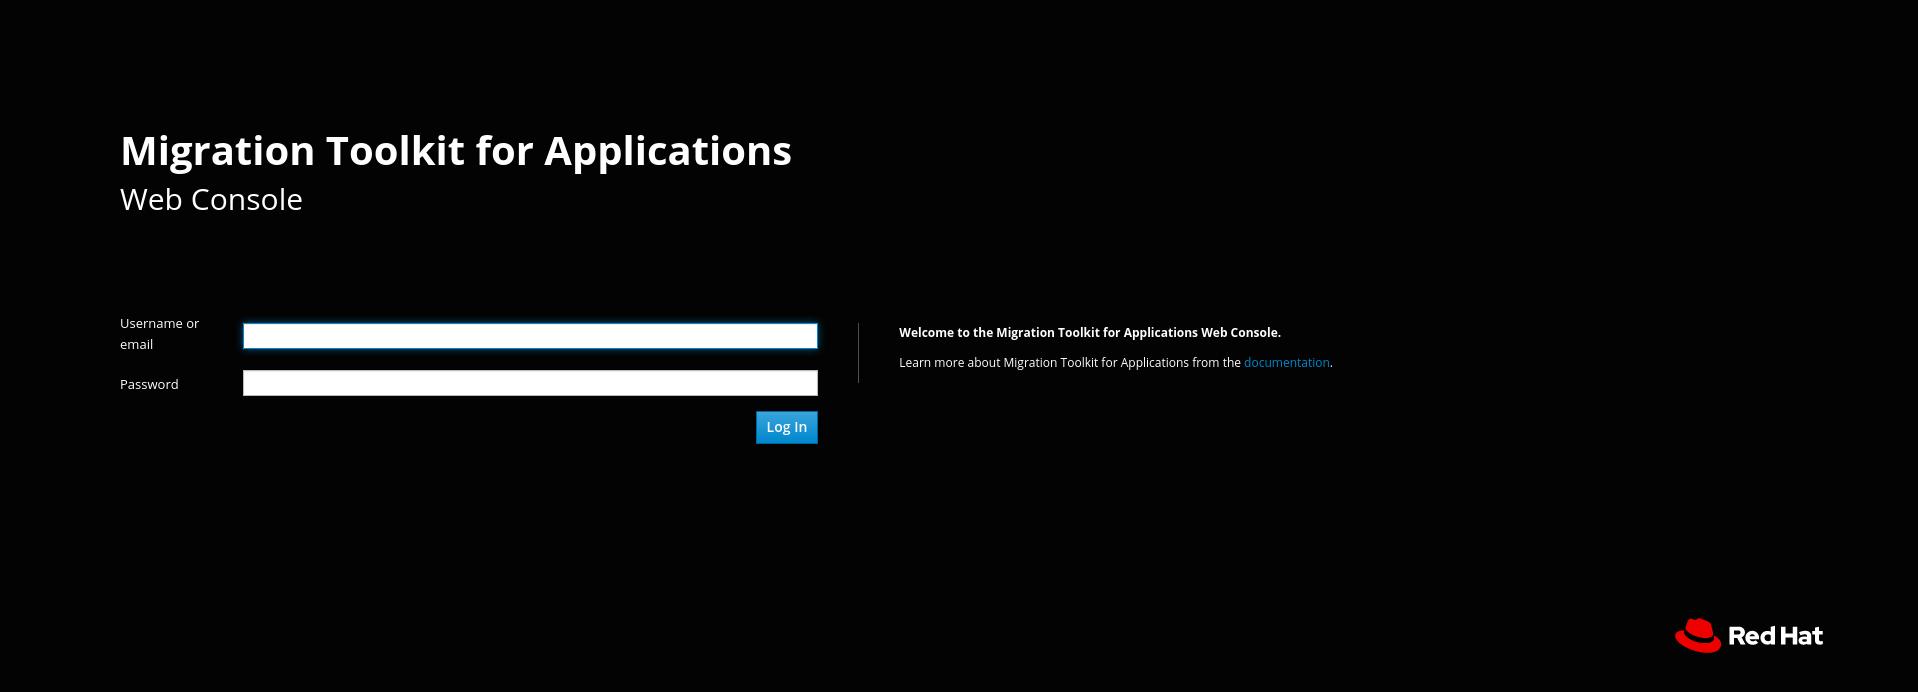 web console login page